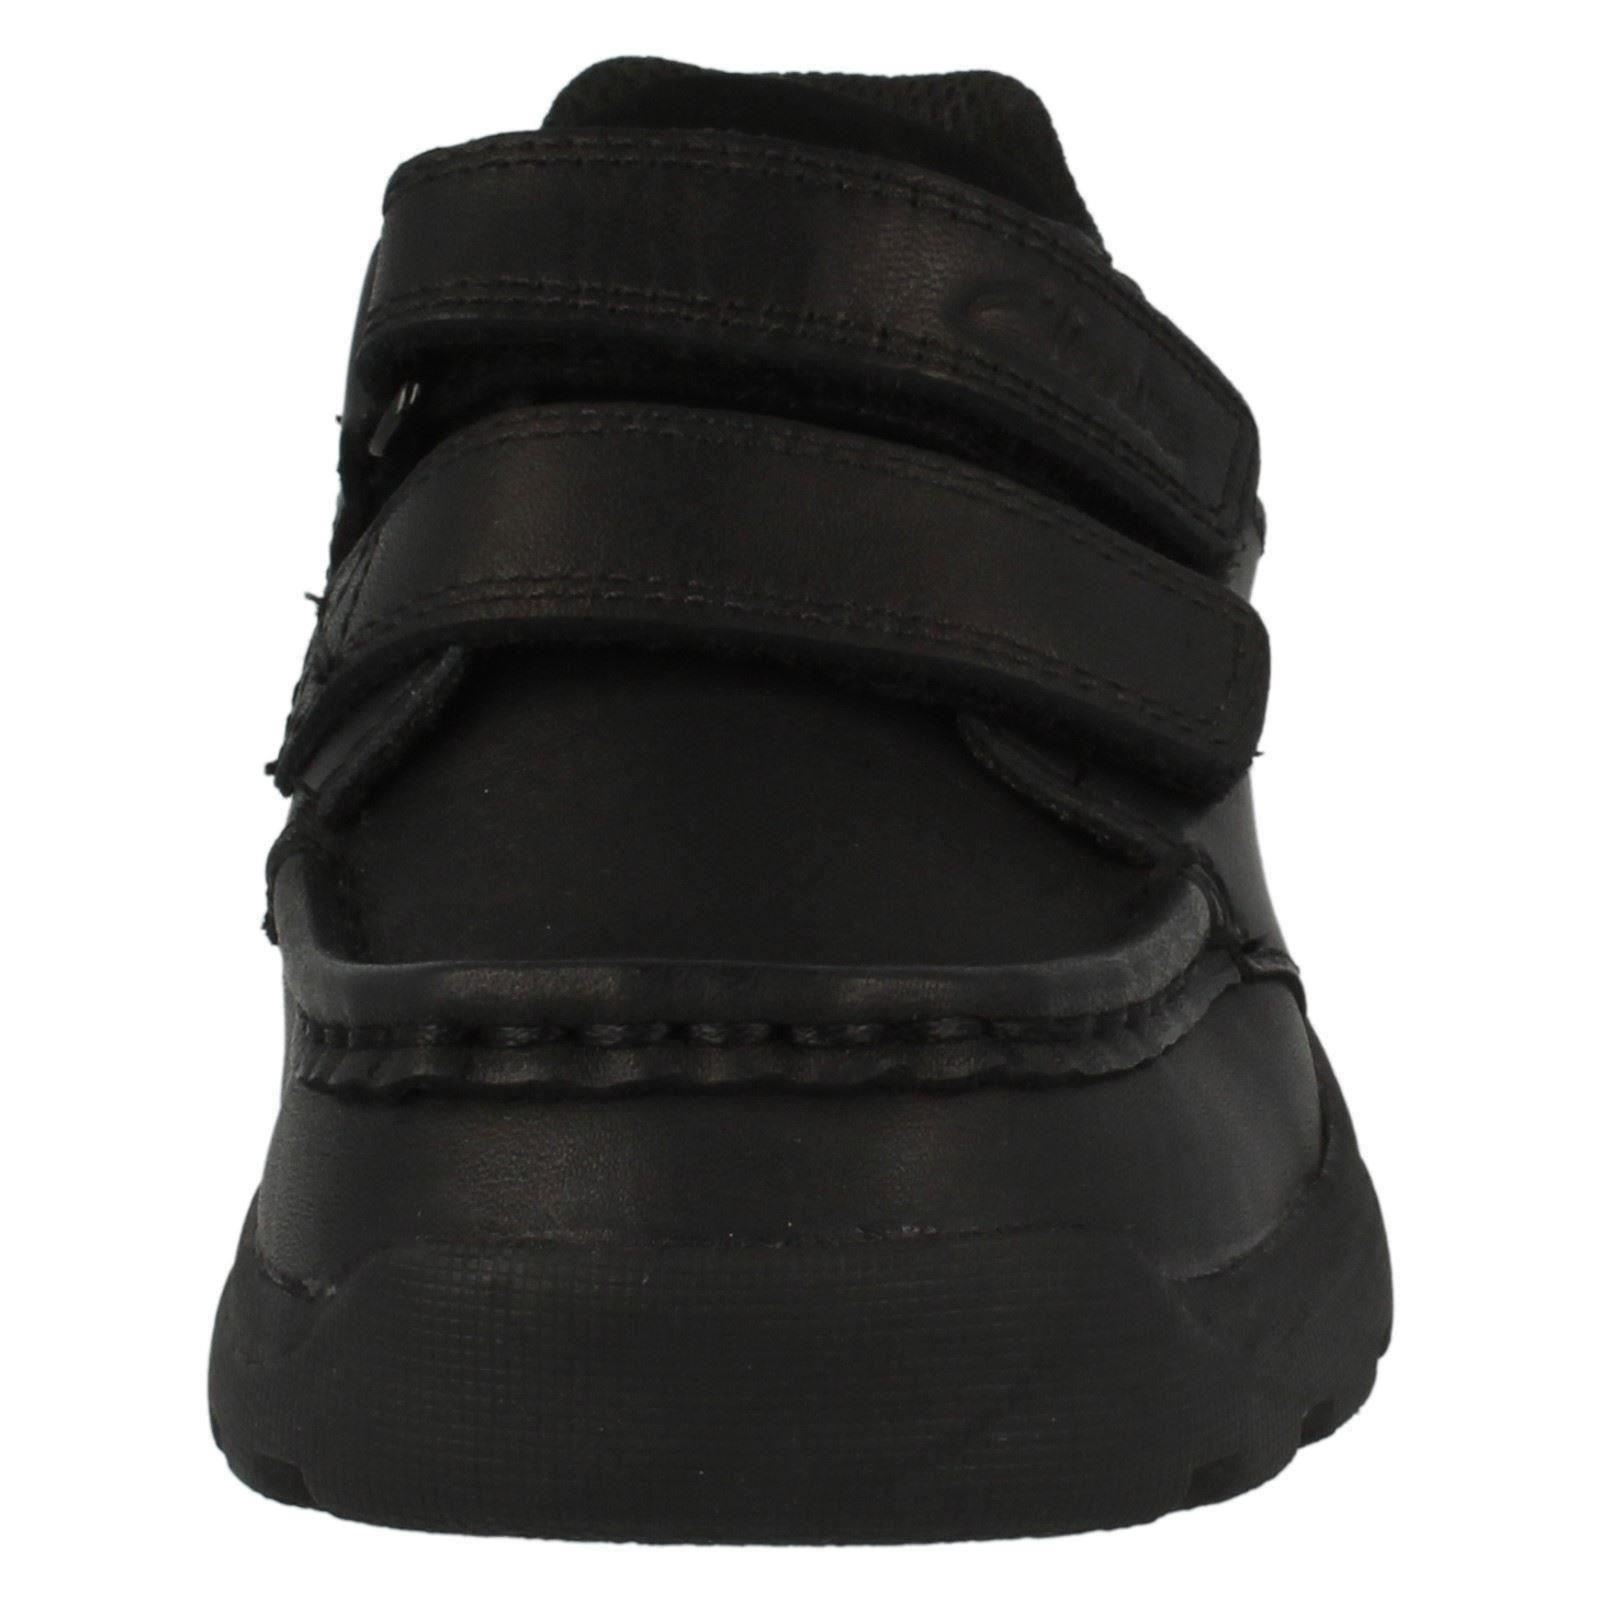 Boys Clarks Leather School Shoes *Zayden Go*